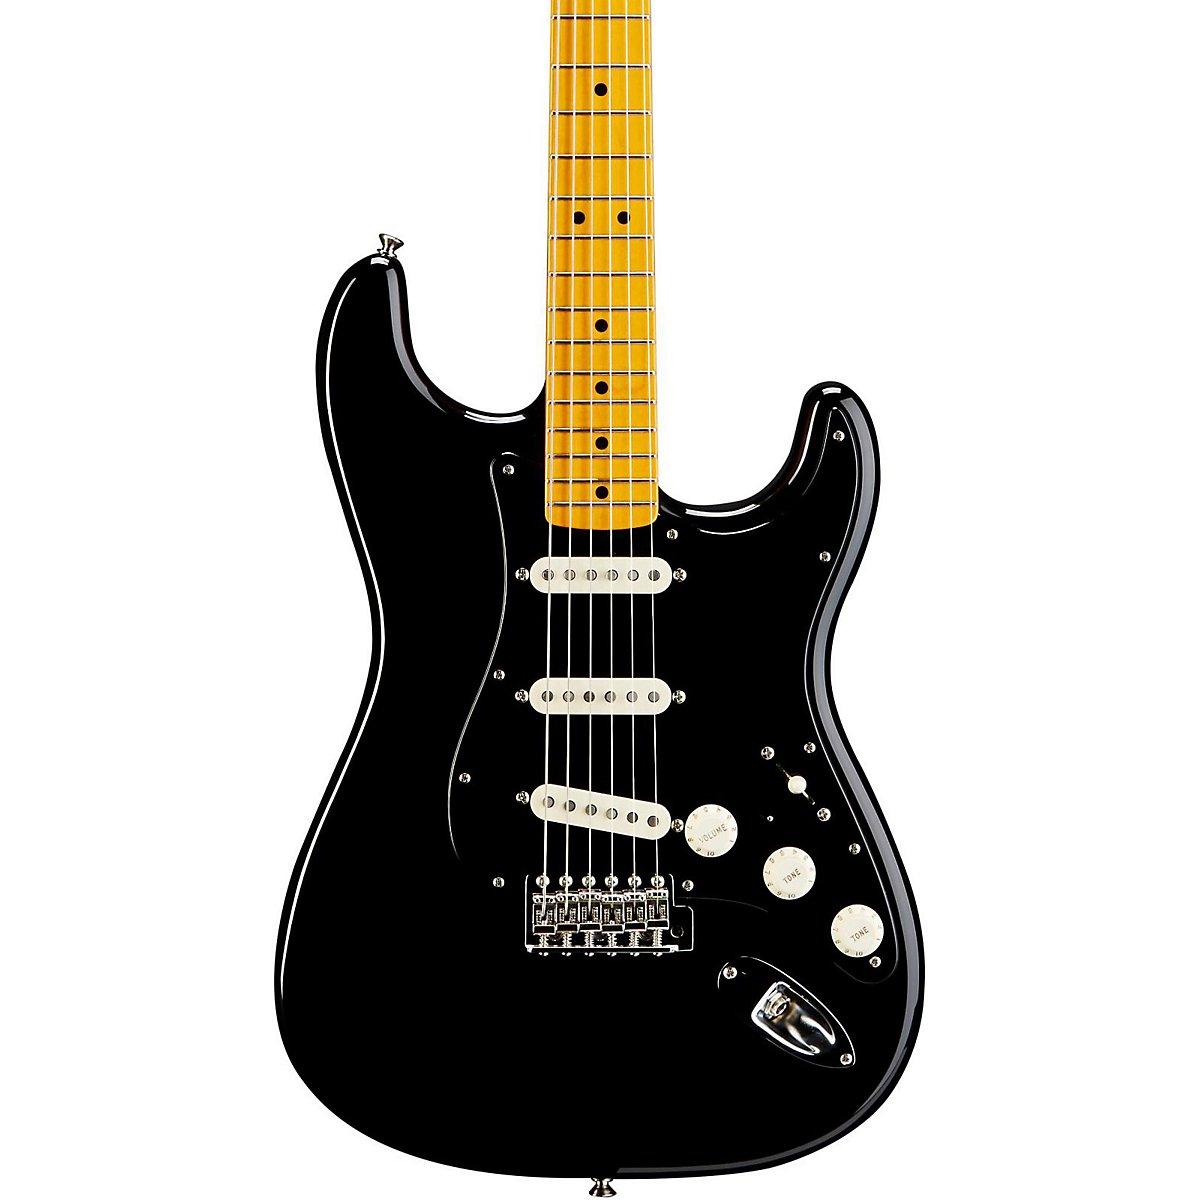 Fender David Gilmour Stratocaster NOS · Guitarra eléctrica: Amazon.es: Instrumentos musicales